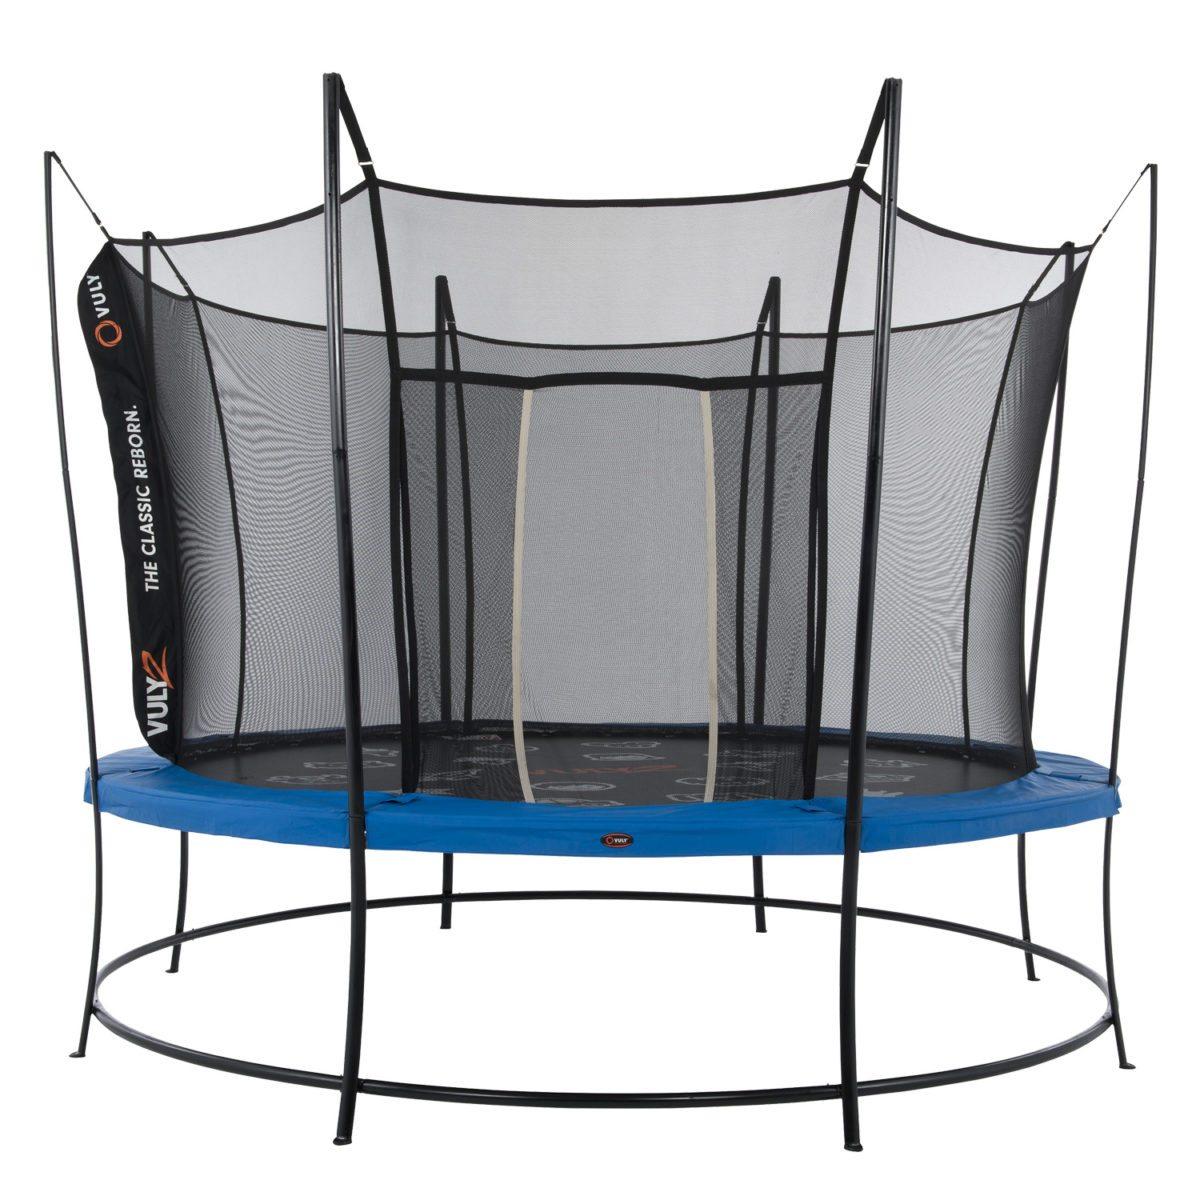 Trampoline for backyard - Gartentrampolin stiftung warentest ...